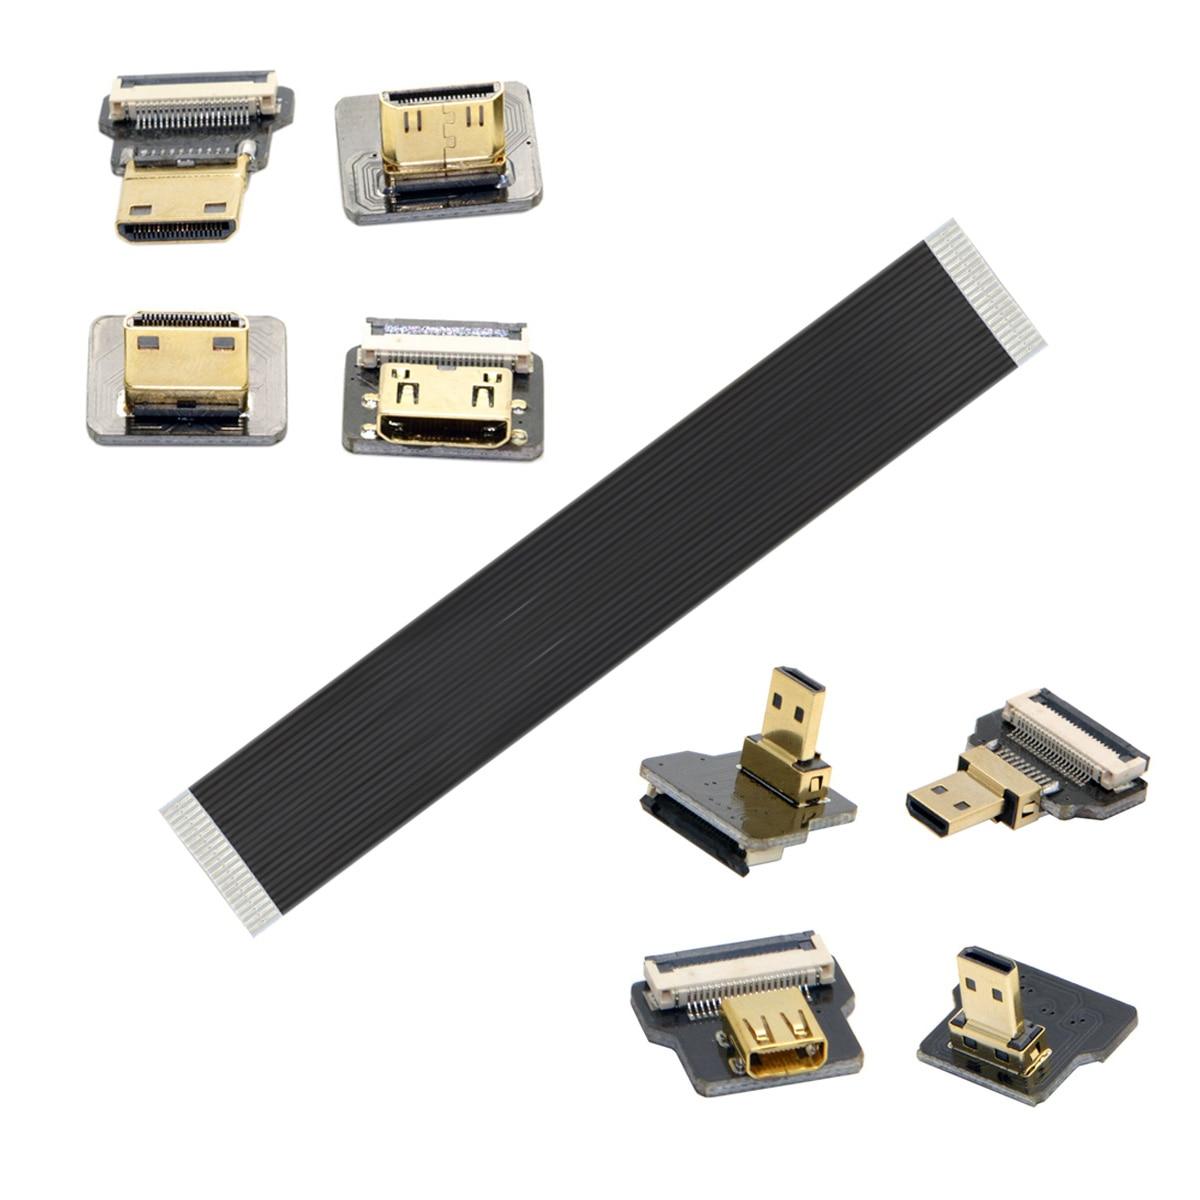 Jimier Angular FPV MicroHDMI Para HDMI Cabo Plano FPC 20 Cm 30 Cm 50 Cm Pe Pes Para Sj4000 Sjcam Sj5000 Gopro Hero 4 \\